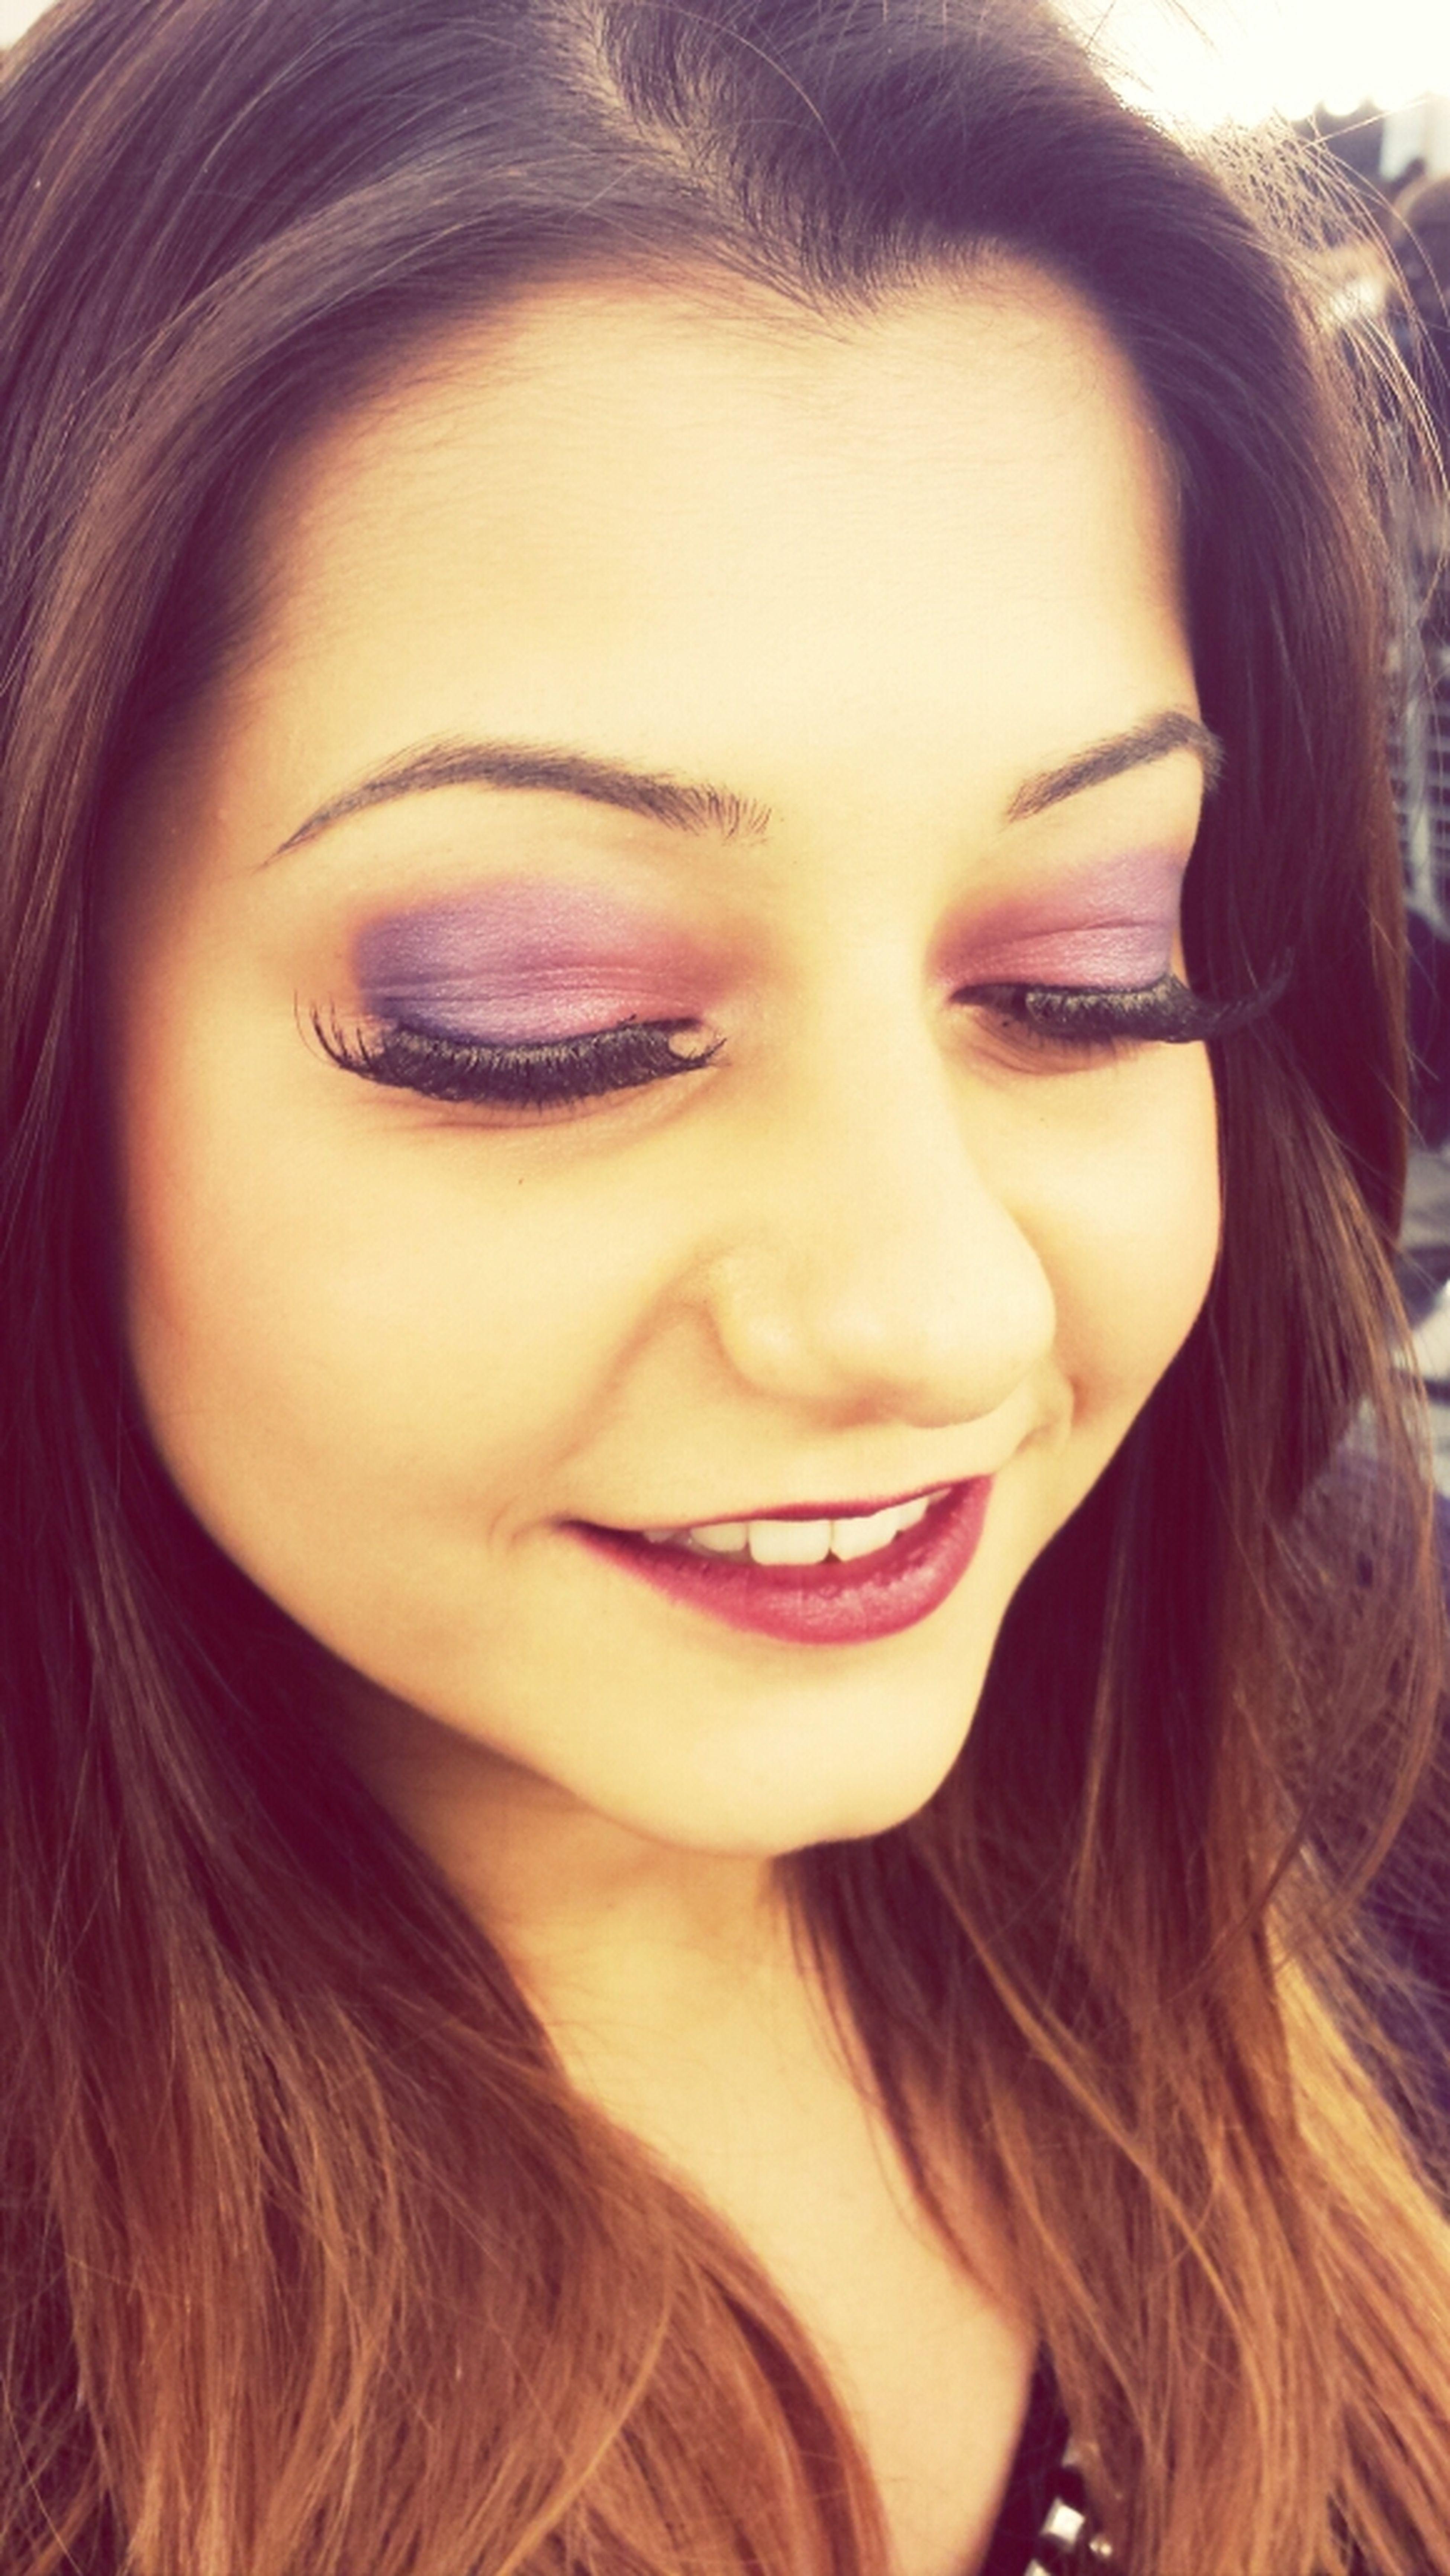 Eye Make Up Look Sofisticato Just Smile